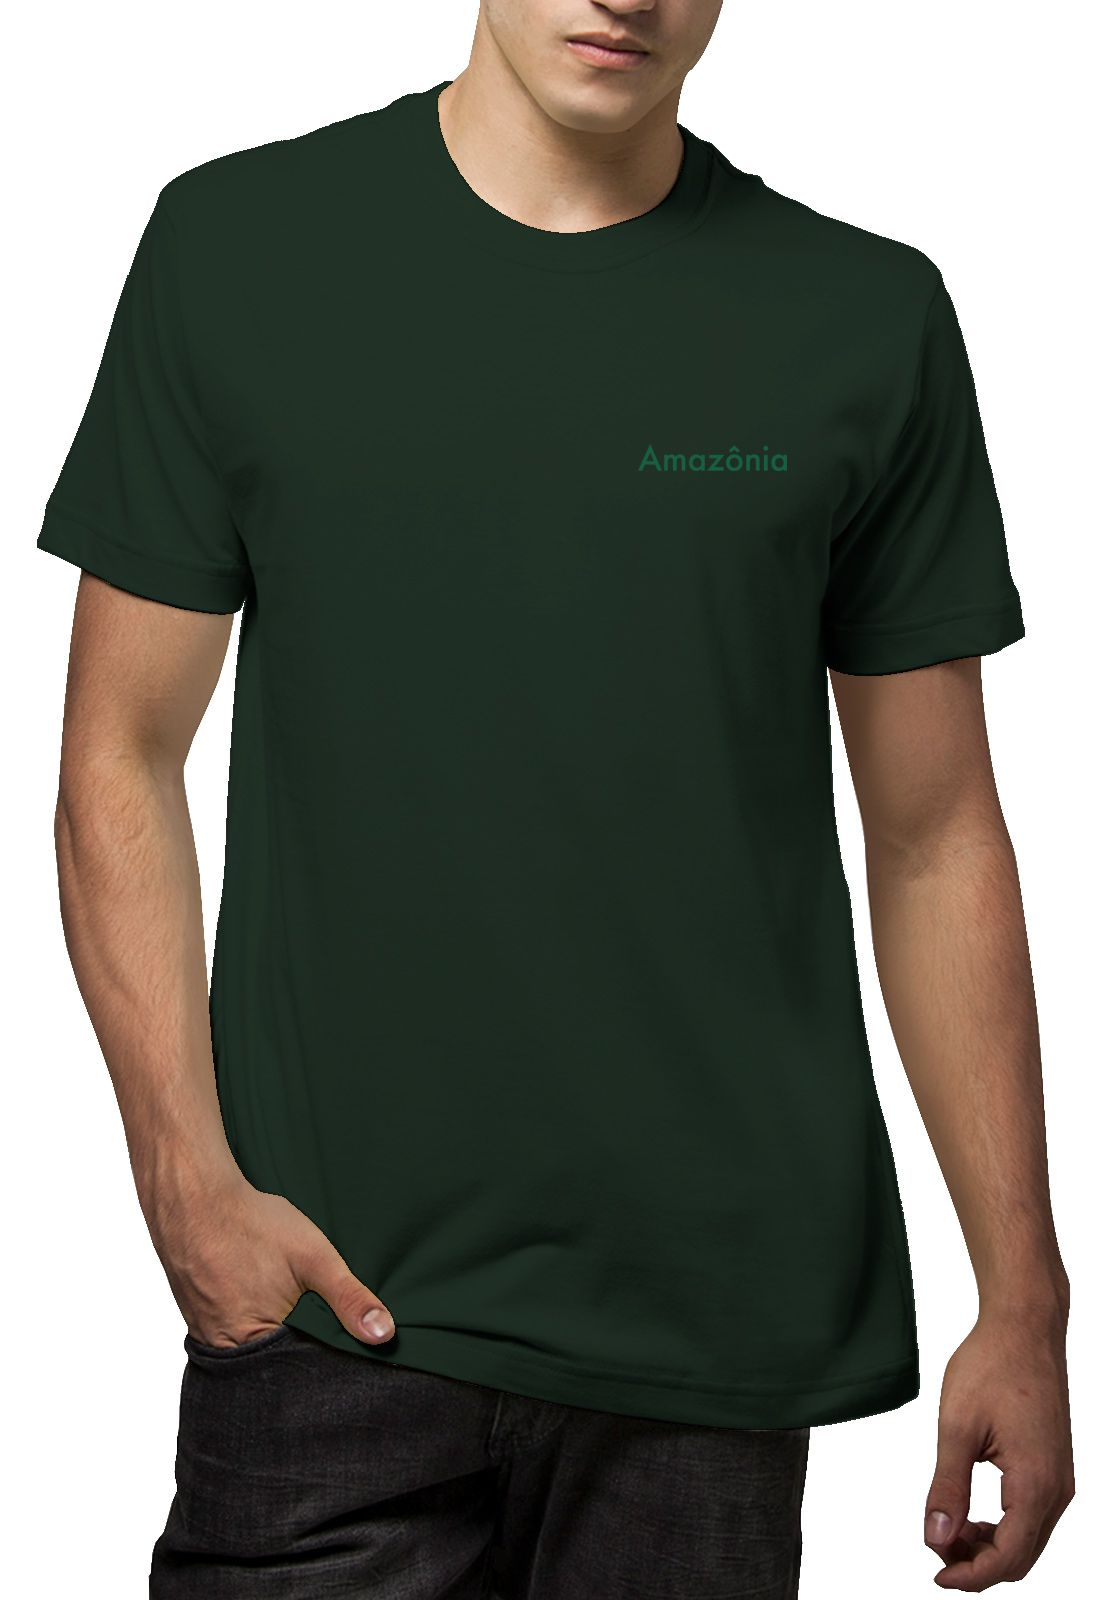 Camiseta Amazônia Mandala Planta - Verde Escuro